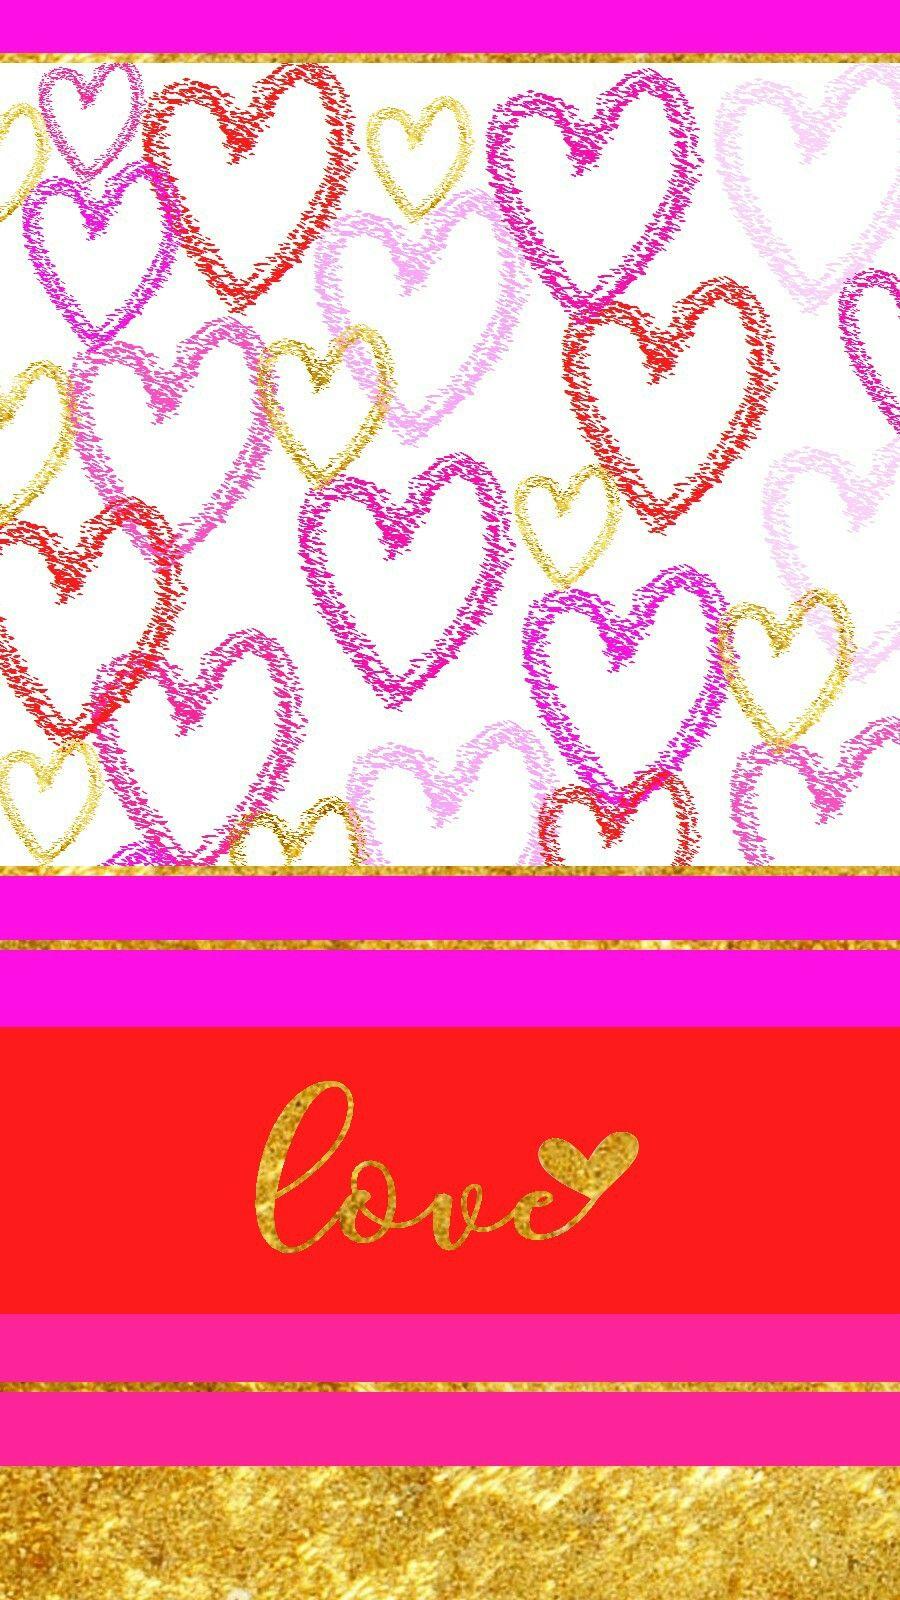 Popular Wallpaper Hello Kitty Huawei - 196e07d8c1ea2fa135cdcb26d8282777  Graphic_909288.jpg